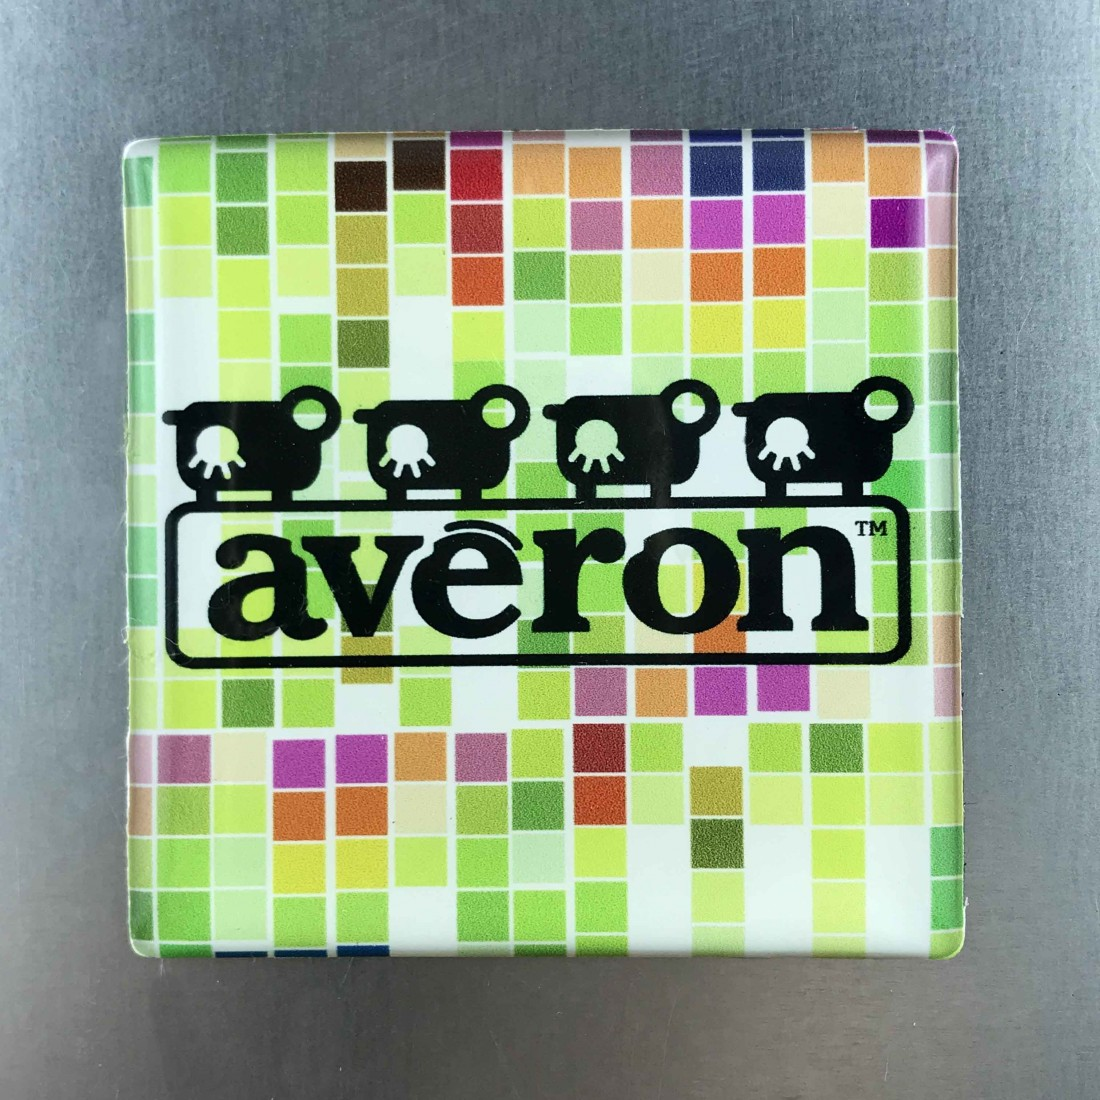 Aimant Avéron 12